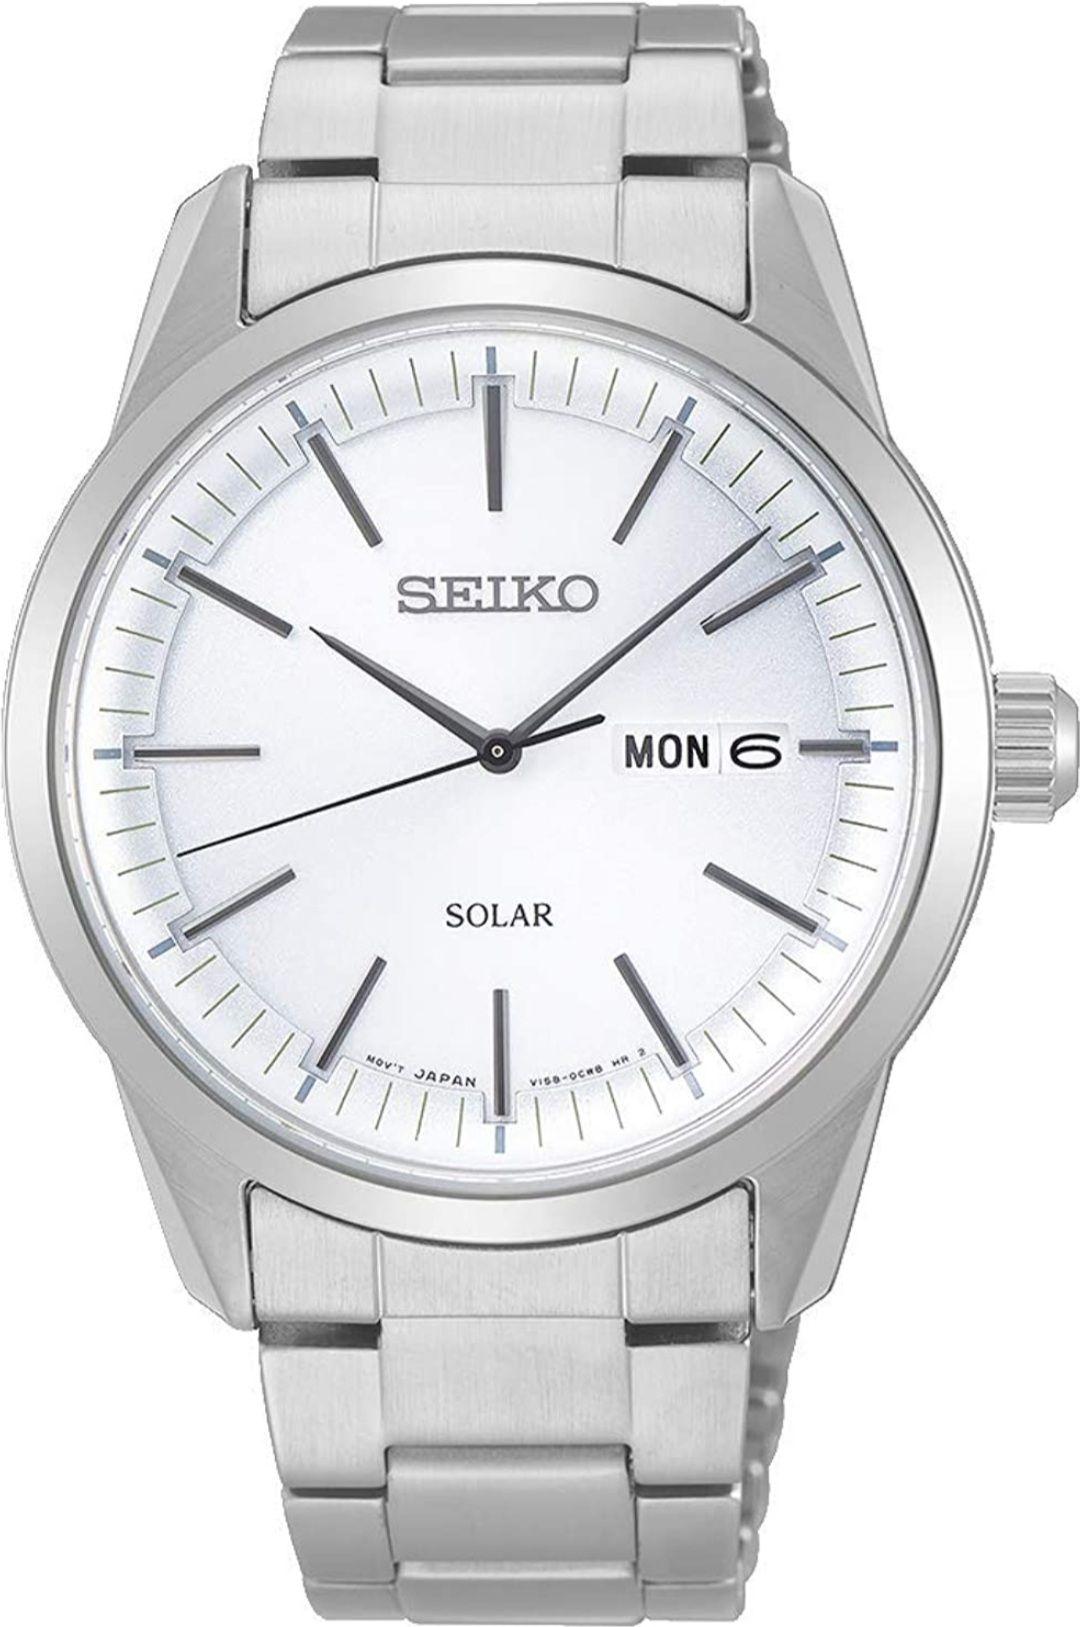 Reloj Seiko Solar (cristal de zafiro).